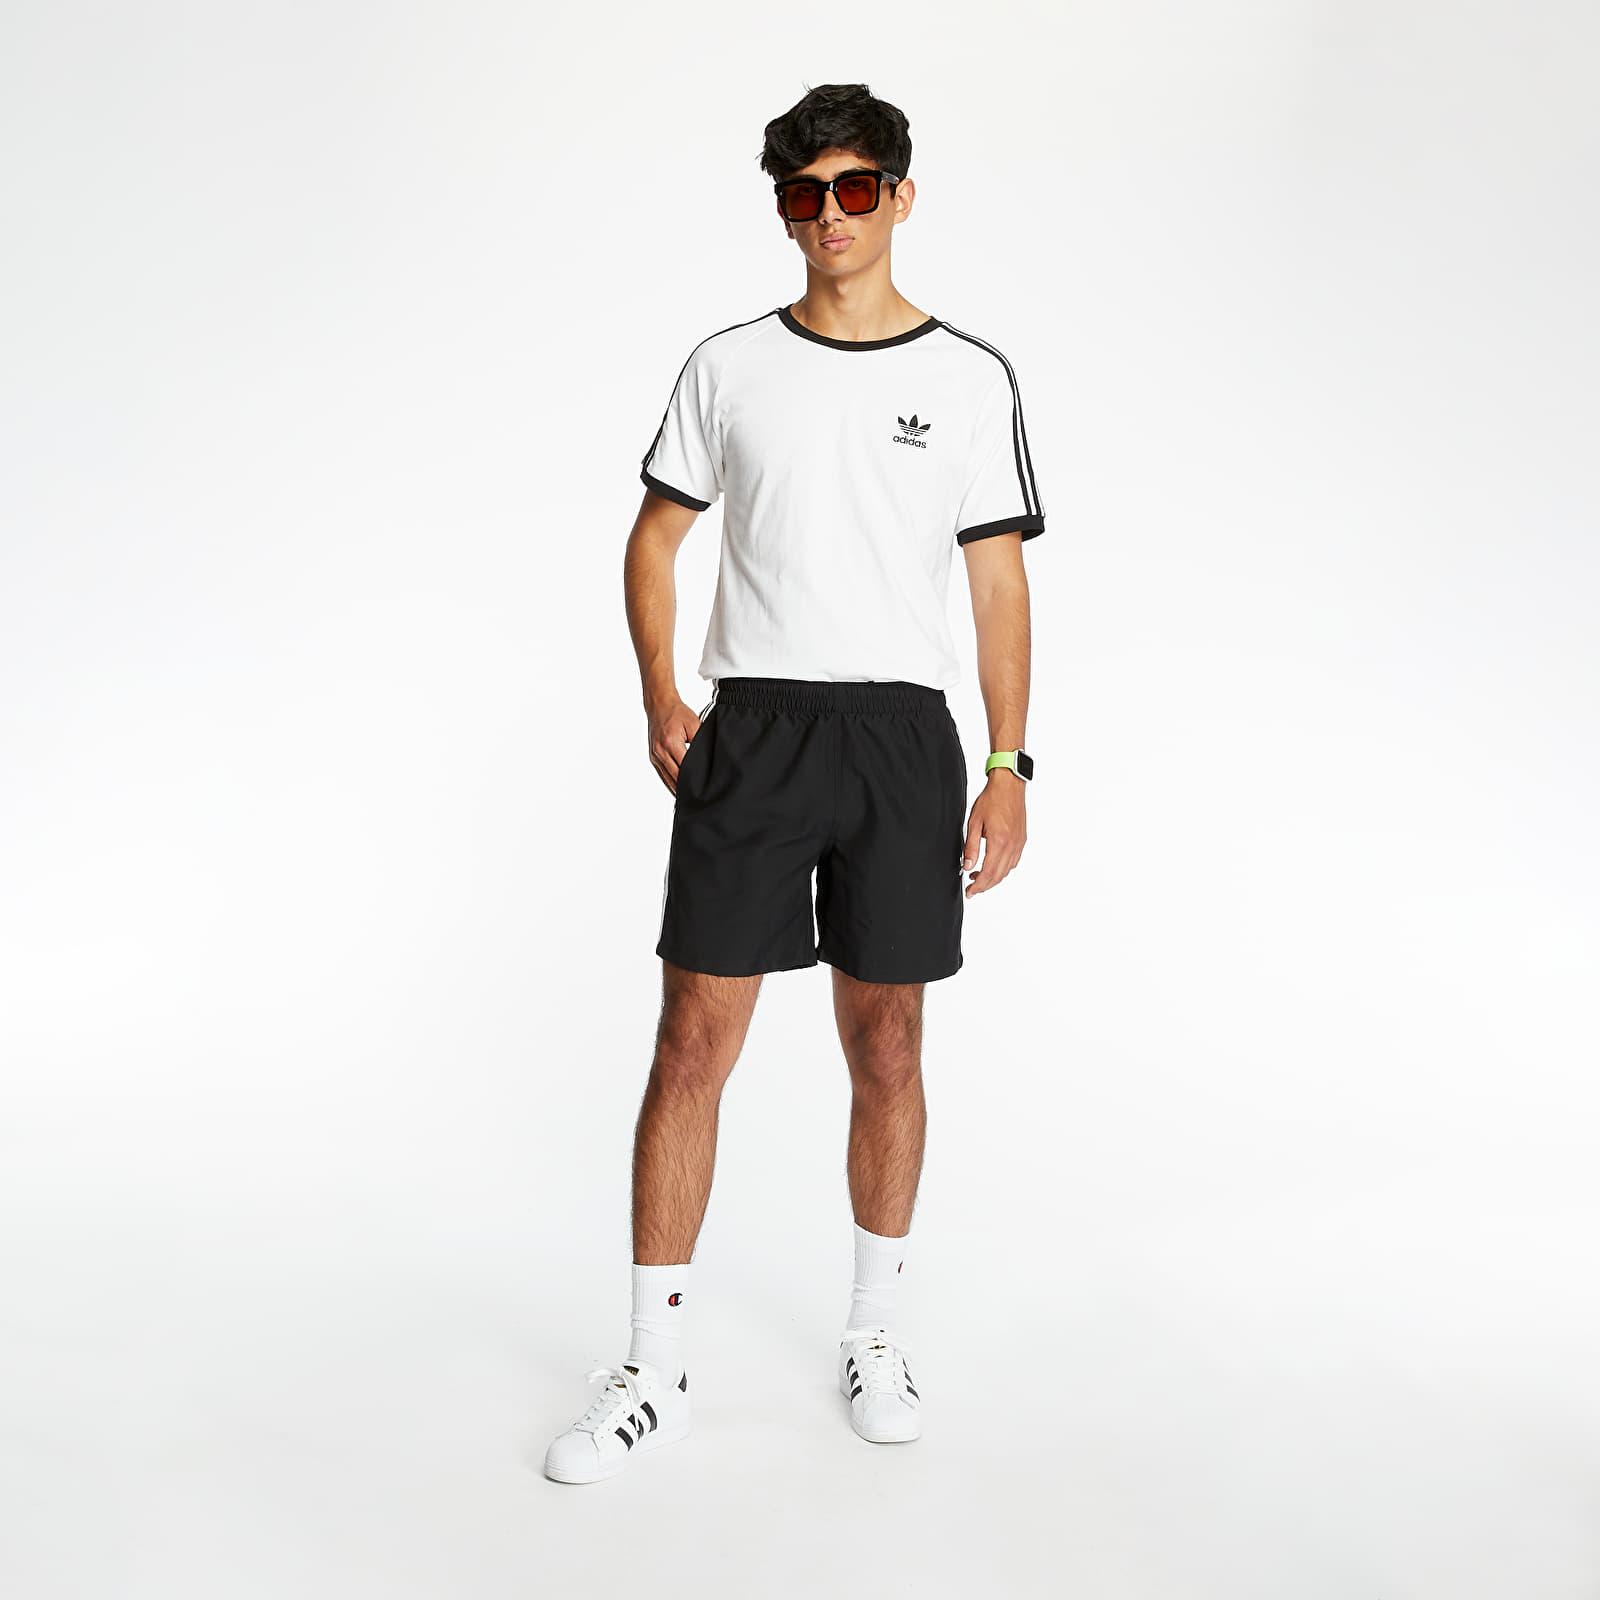 Swimsuit adidas 3 Stripes Swimwear Black